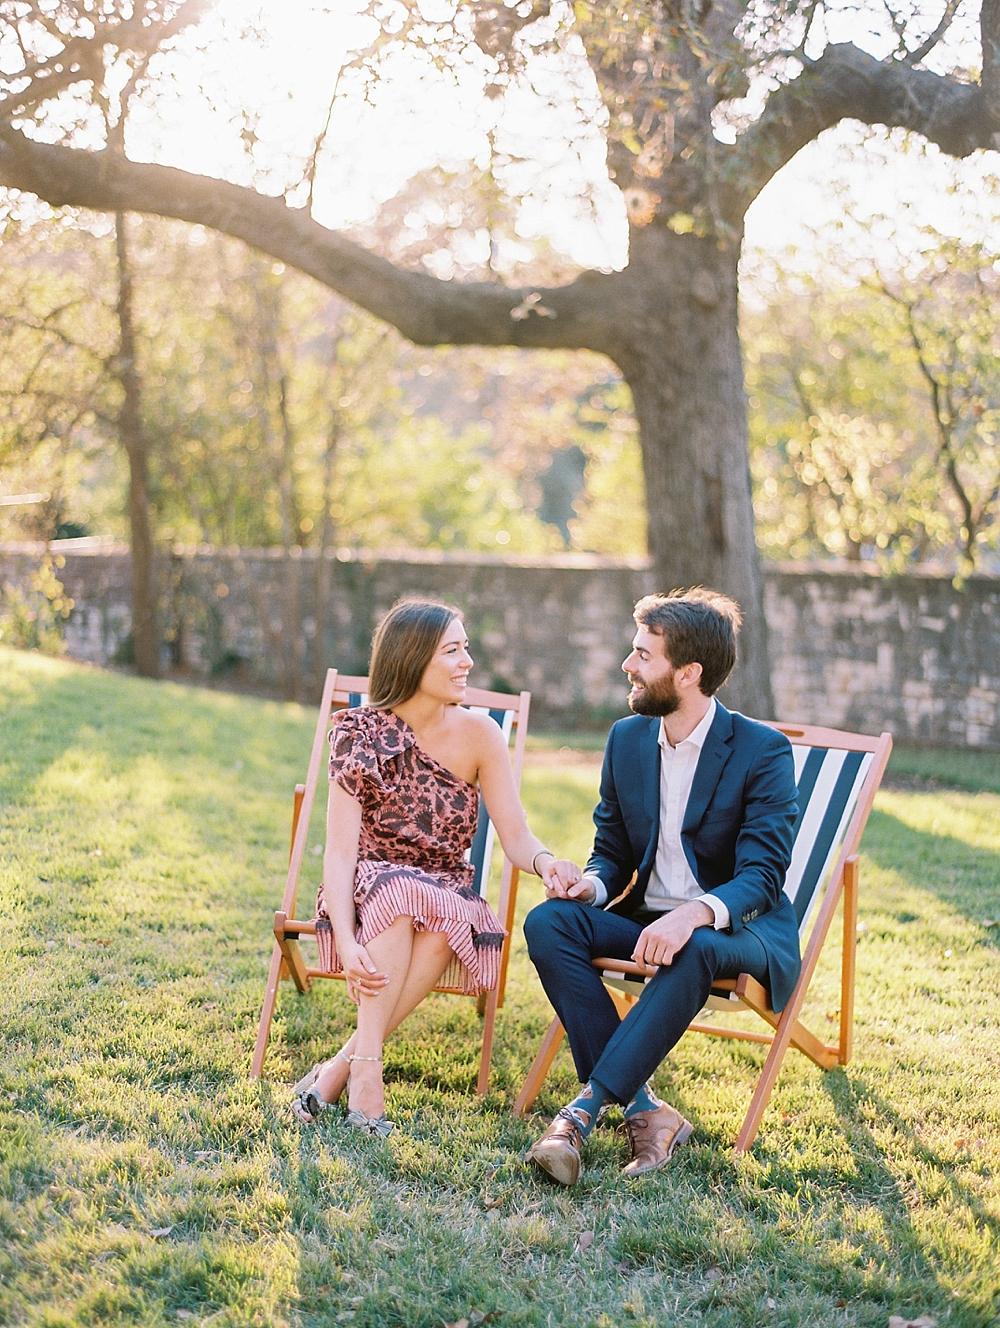 kristin-la-voie-photography-Austin-Wedding-Photographer-laguna-gloria-commodore-perry-estate-engagement-133